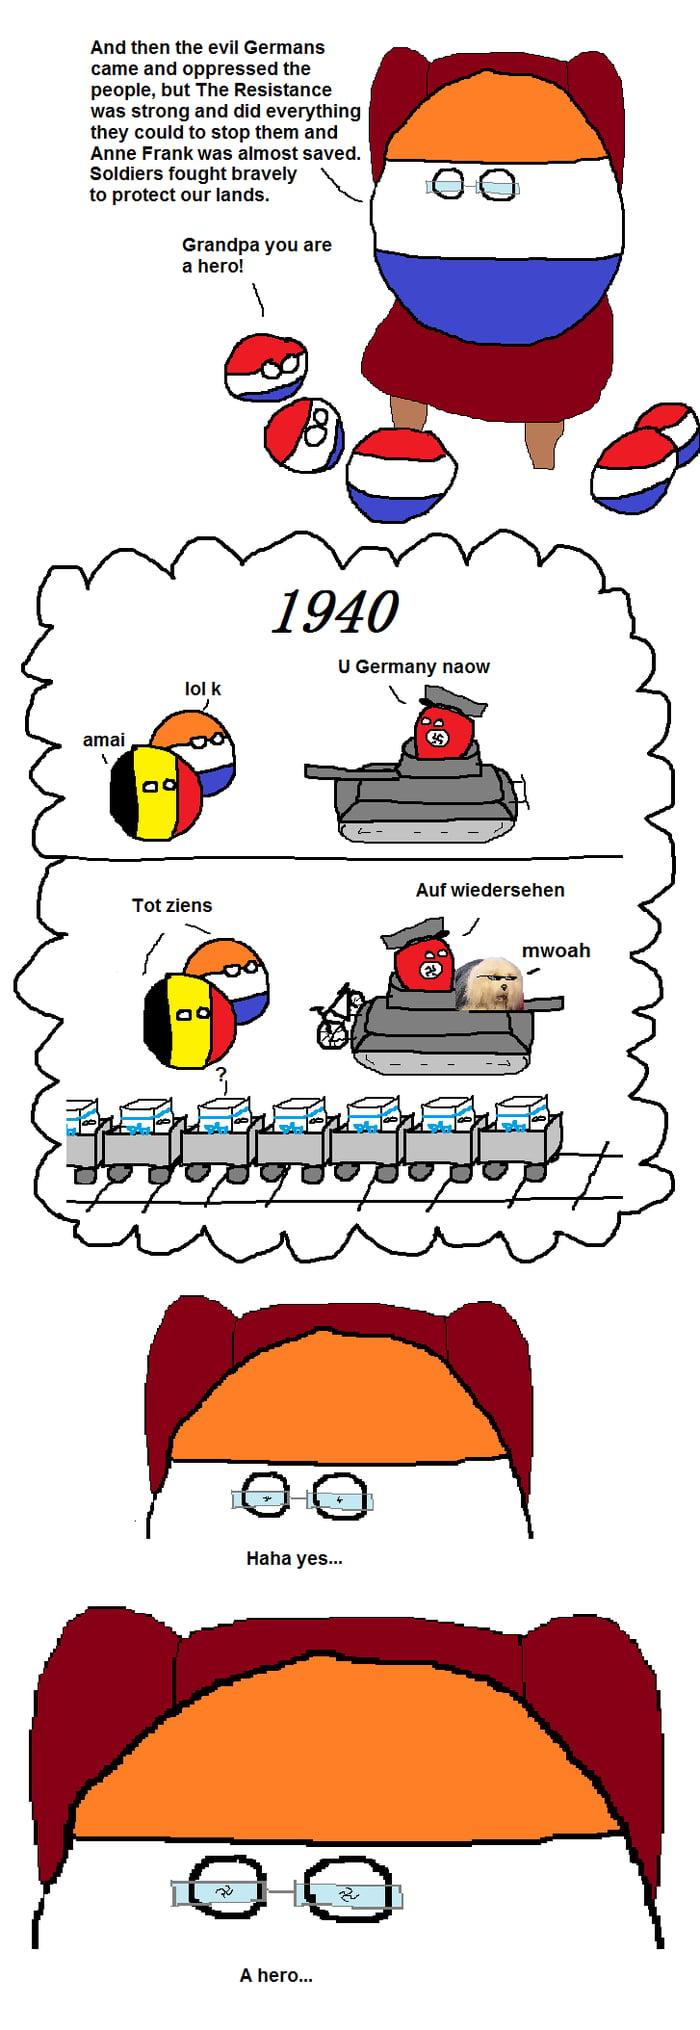 Respect for Poland.